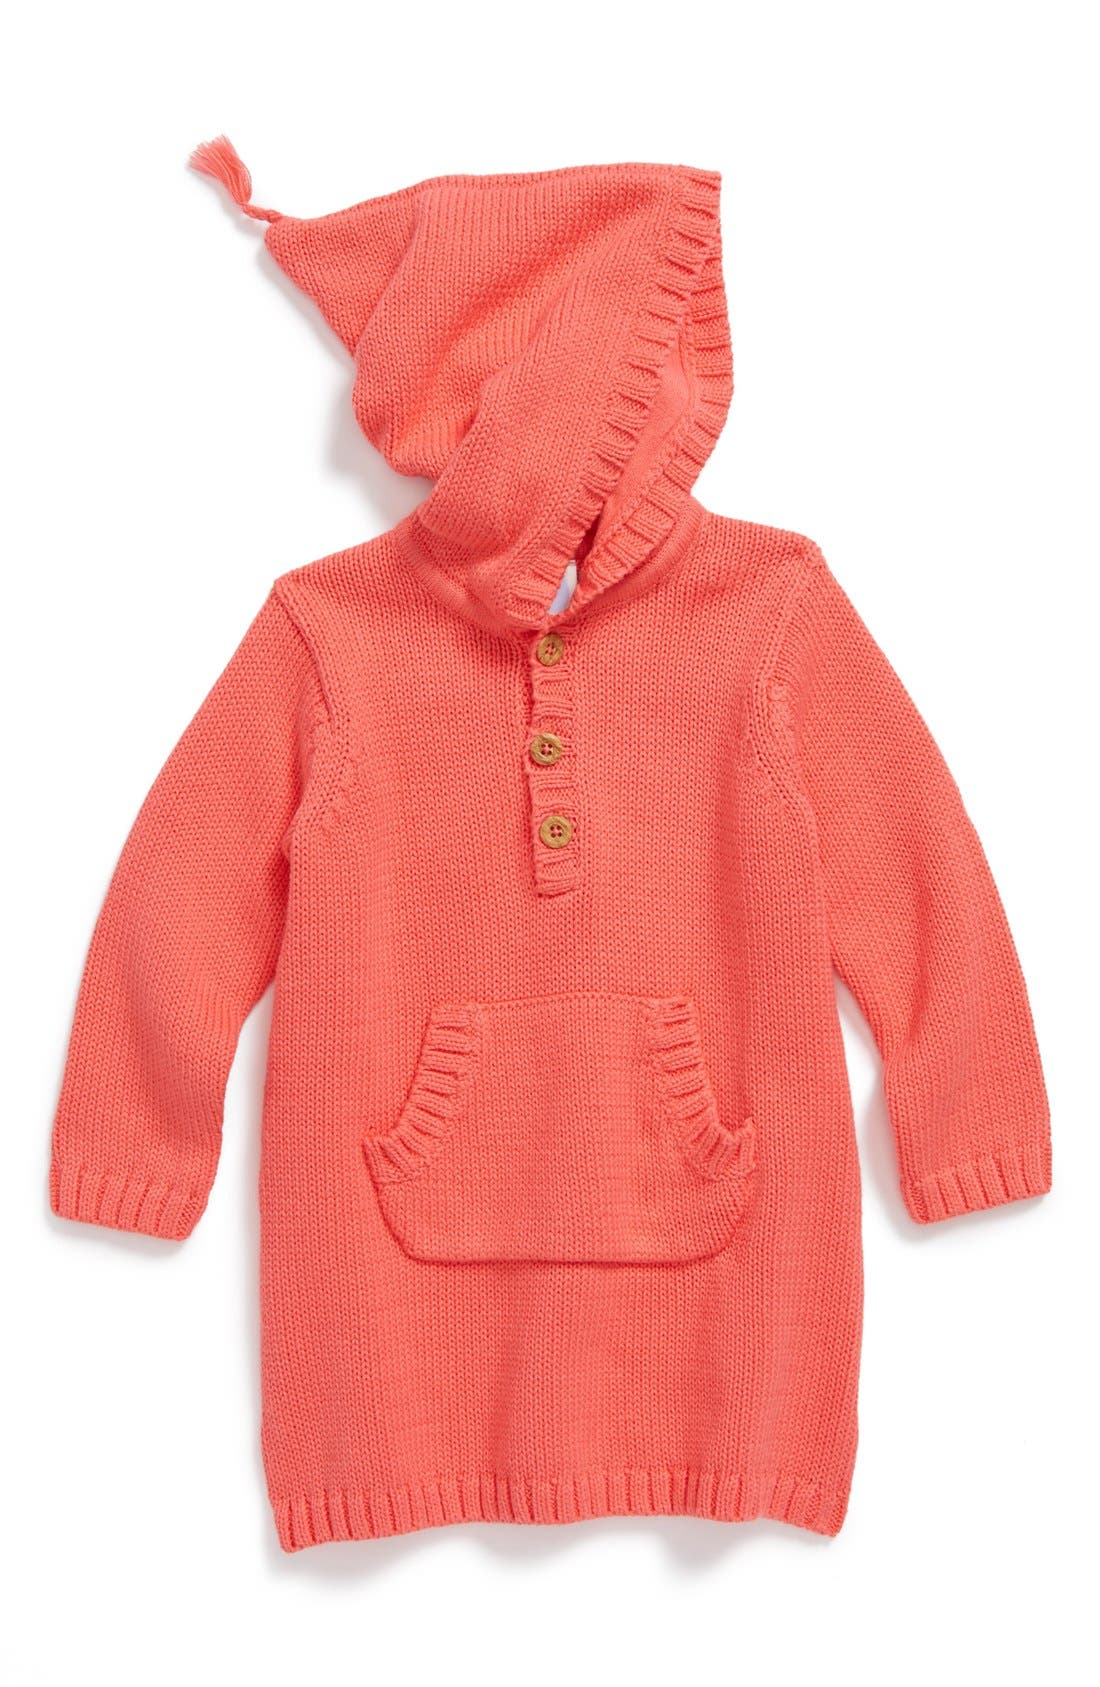 Alternate Image 1 Selected - Stem Baby Hooded Organic Cotton Sweater Dress (Baby Girls)